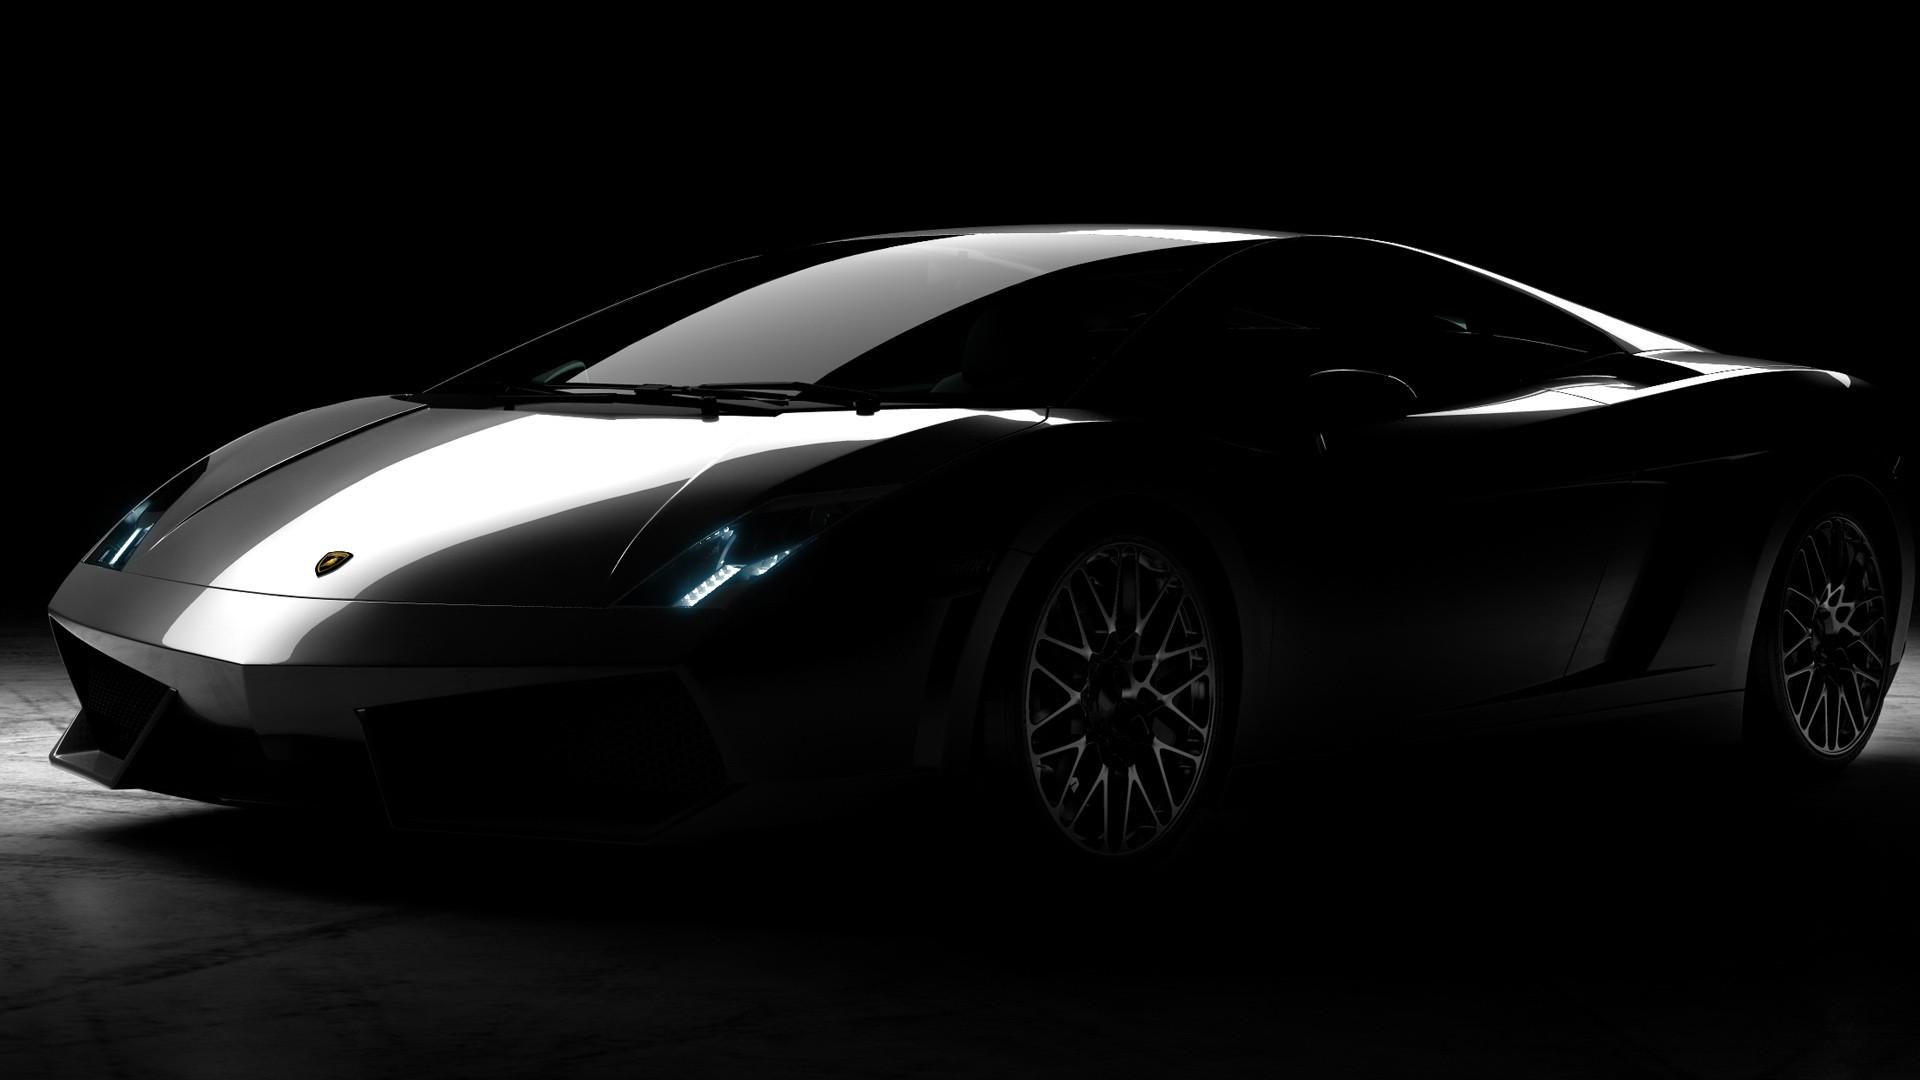 Lamborghini Gallardo LP560 4 Wallpaper | HD Car Wallpapers ...